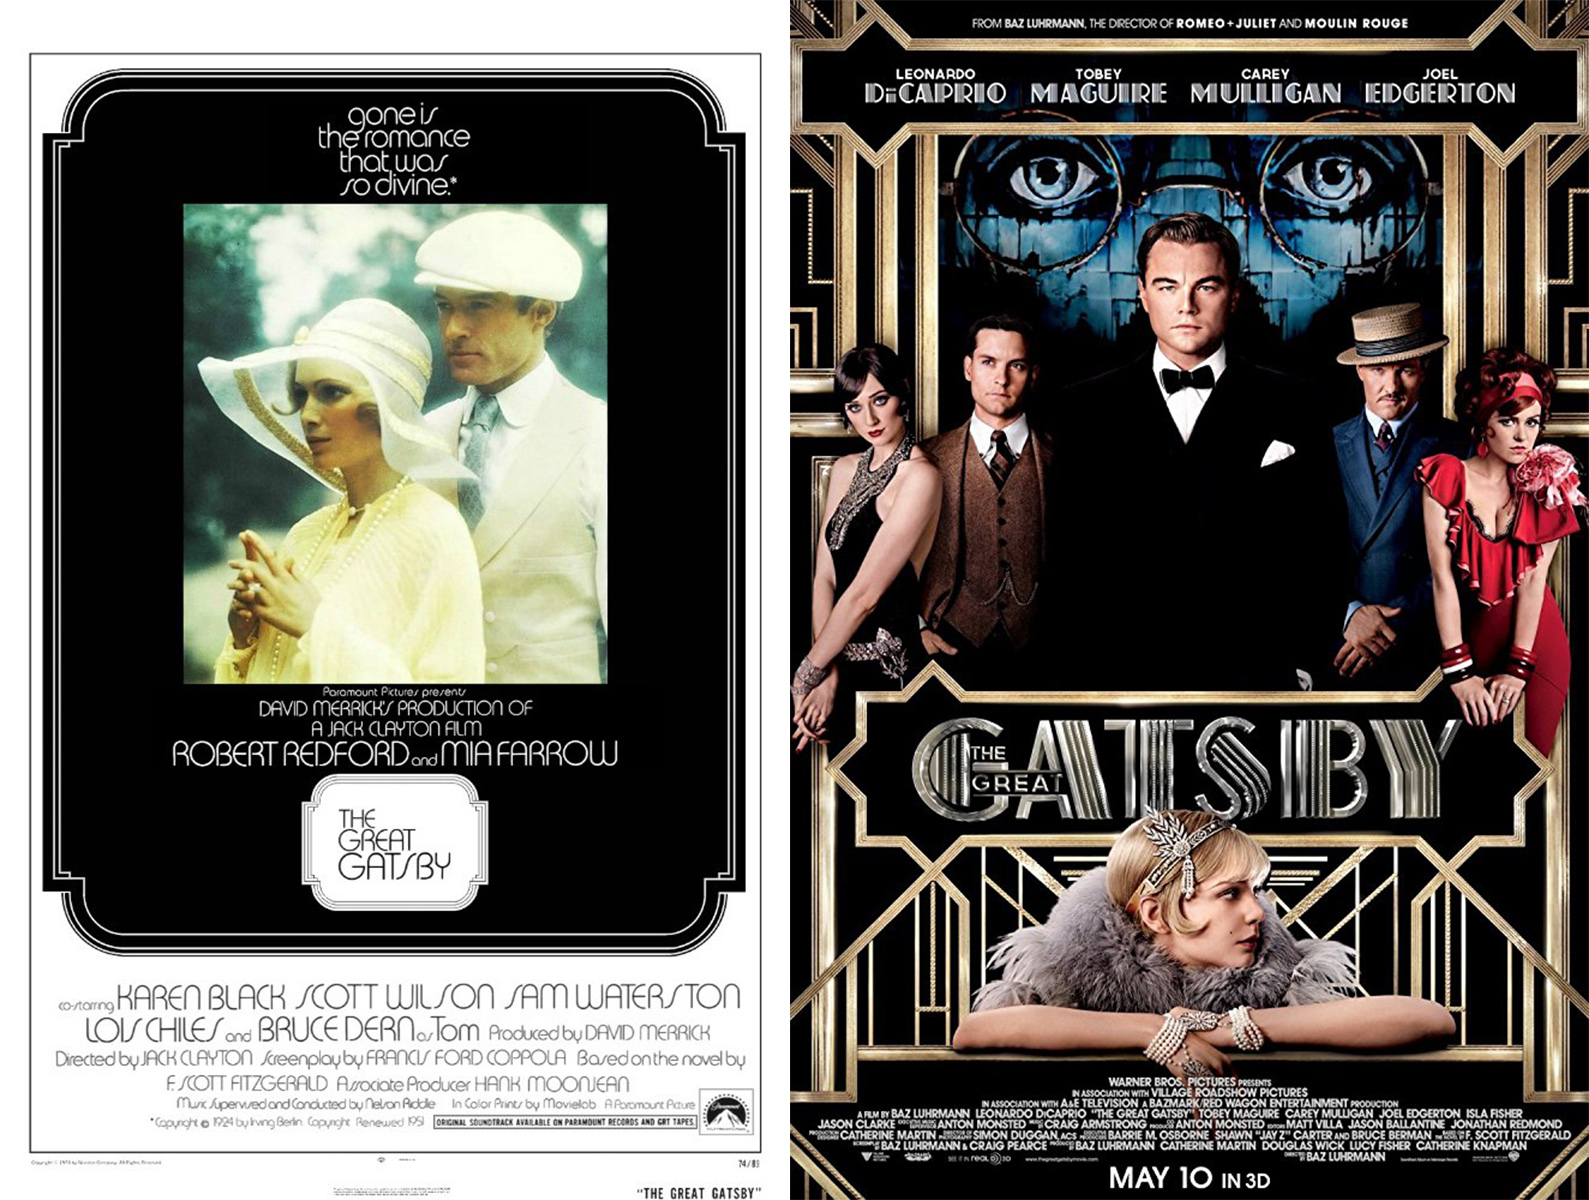 GG posters.jpg